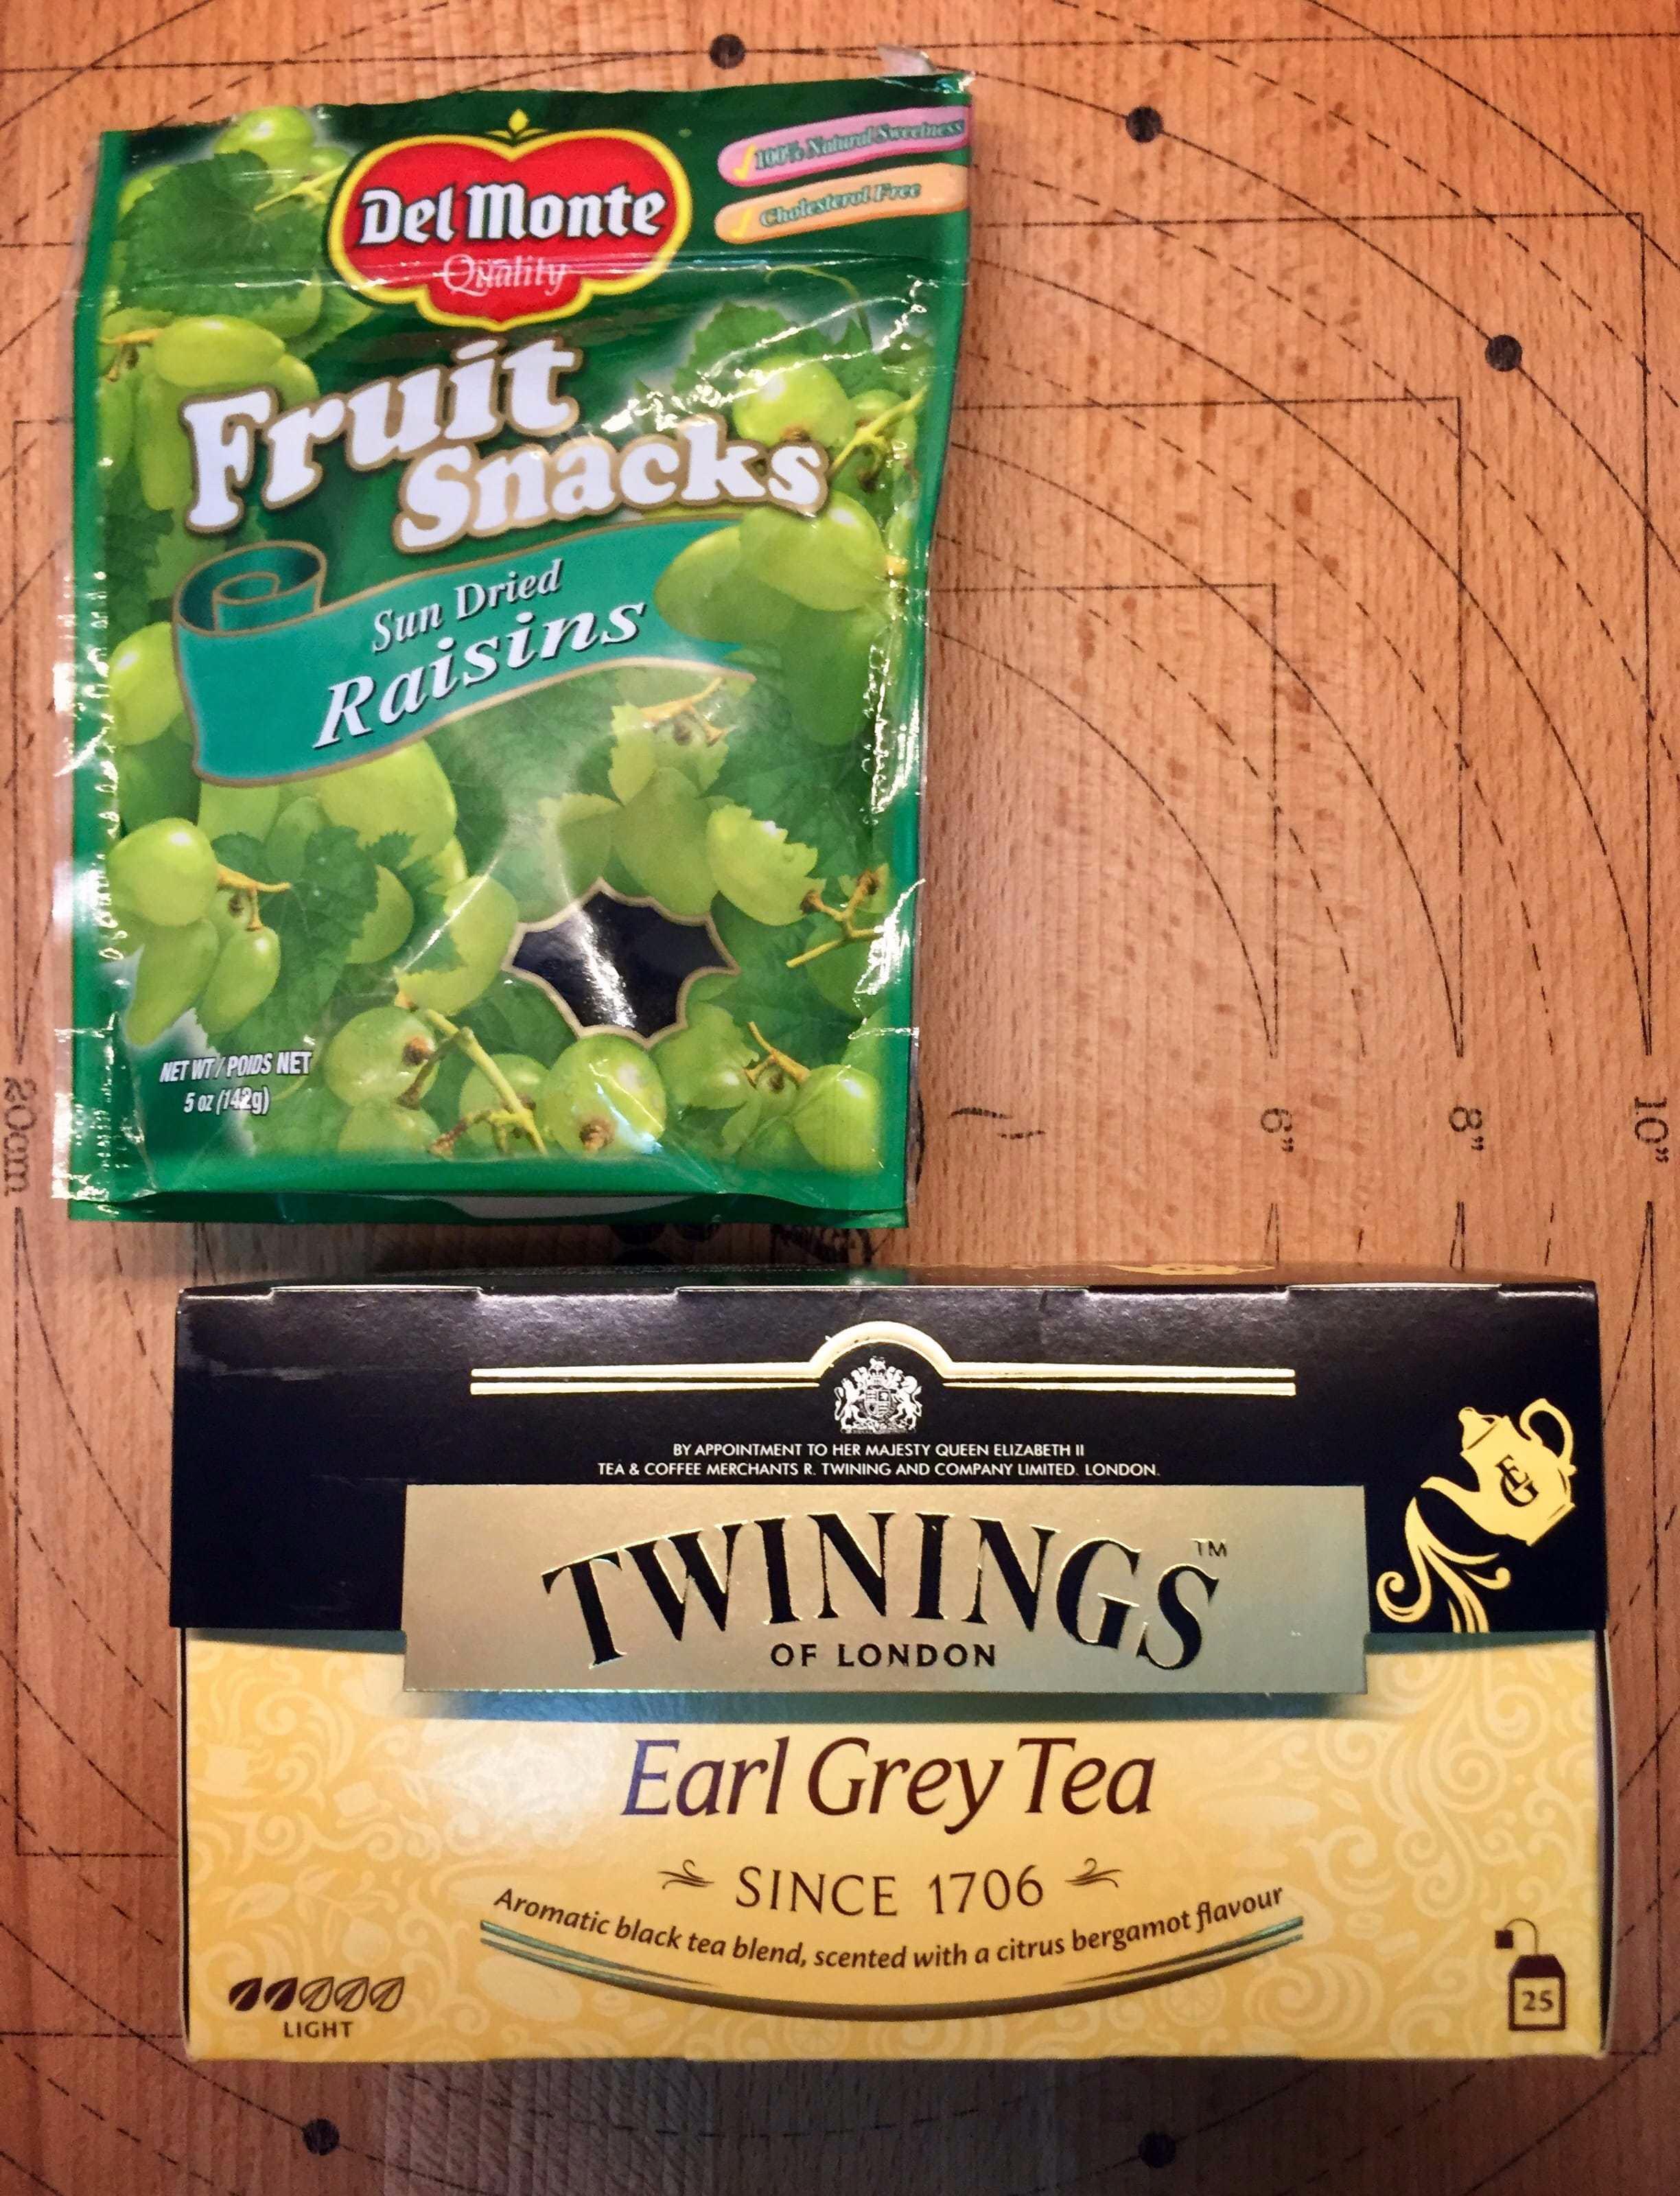 Raisins and Earl Grey Tea